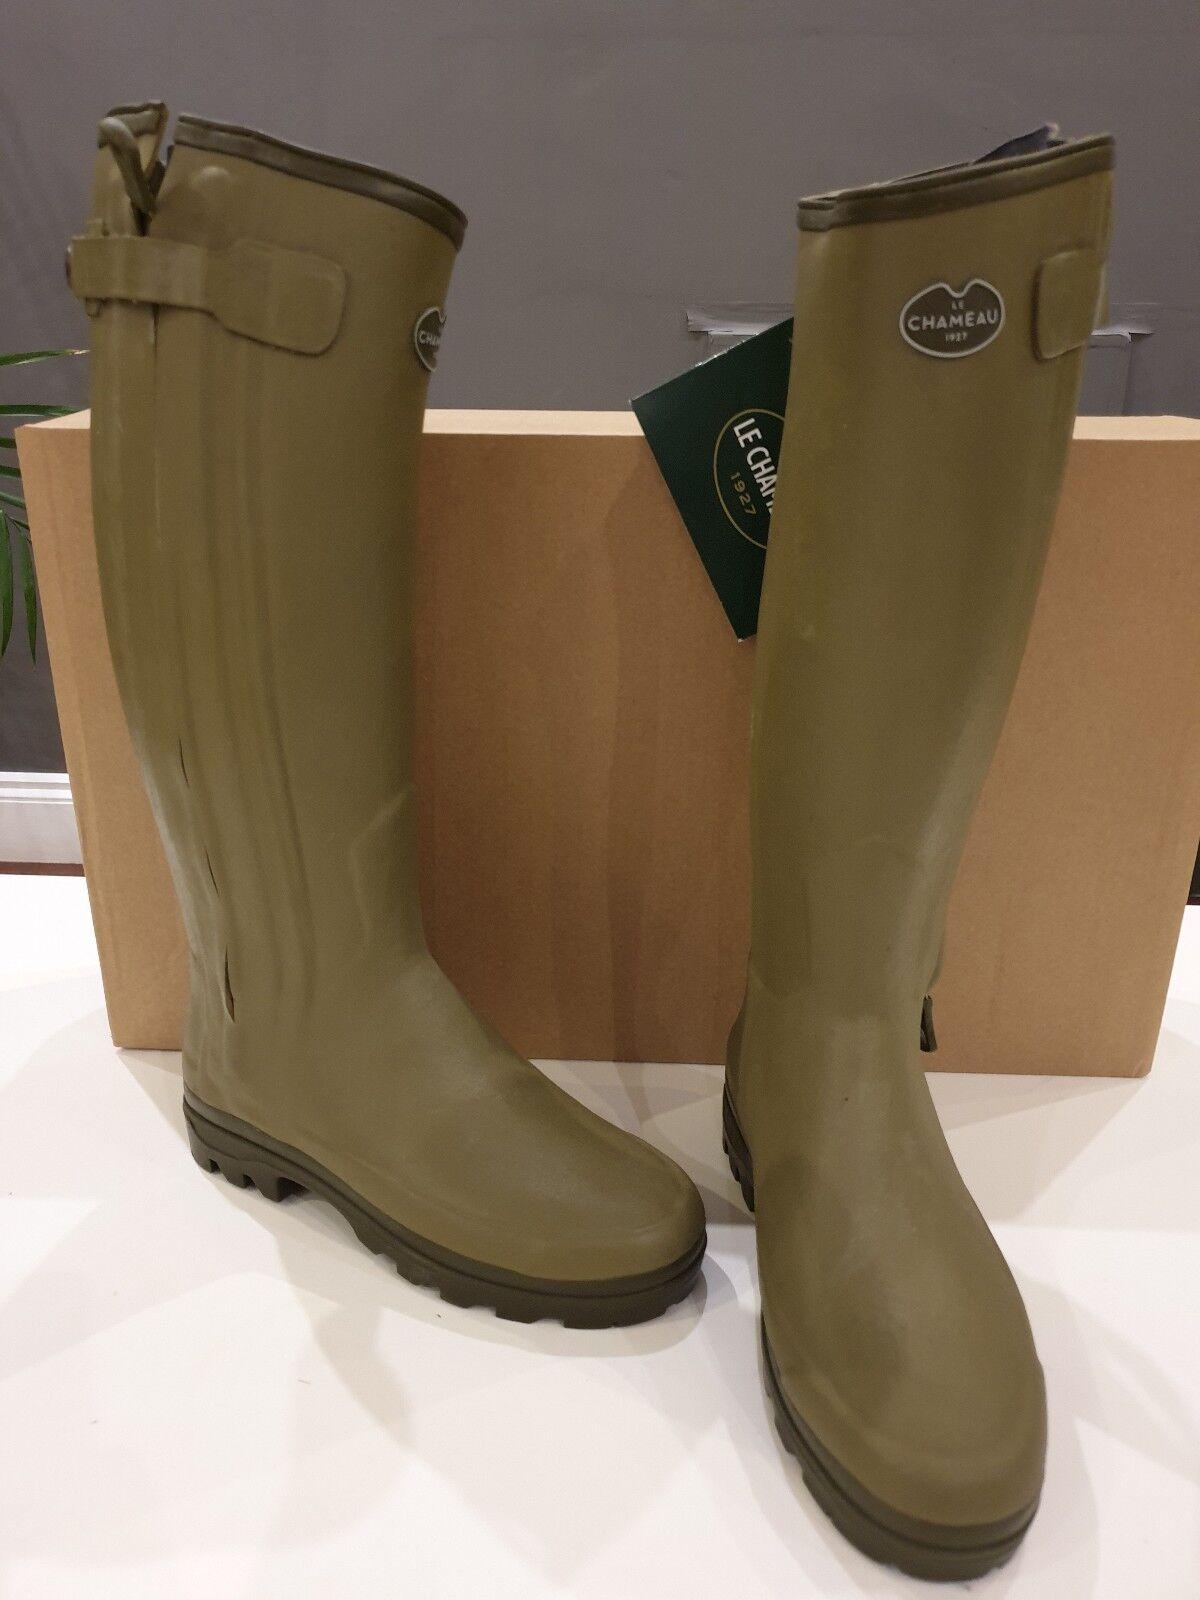 Le Chameau Chasseur Neo Neoprene Wellington Boots Size 36 green Green